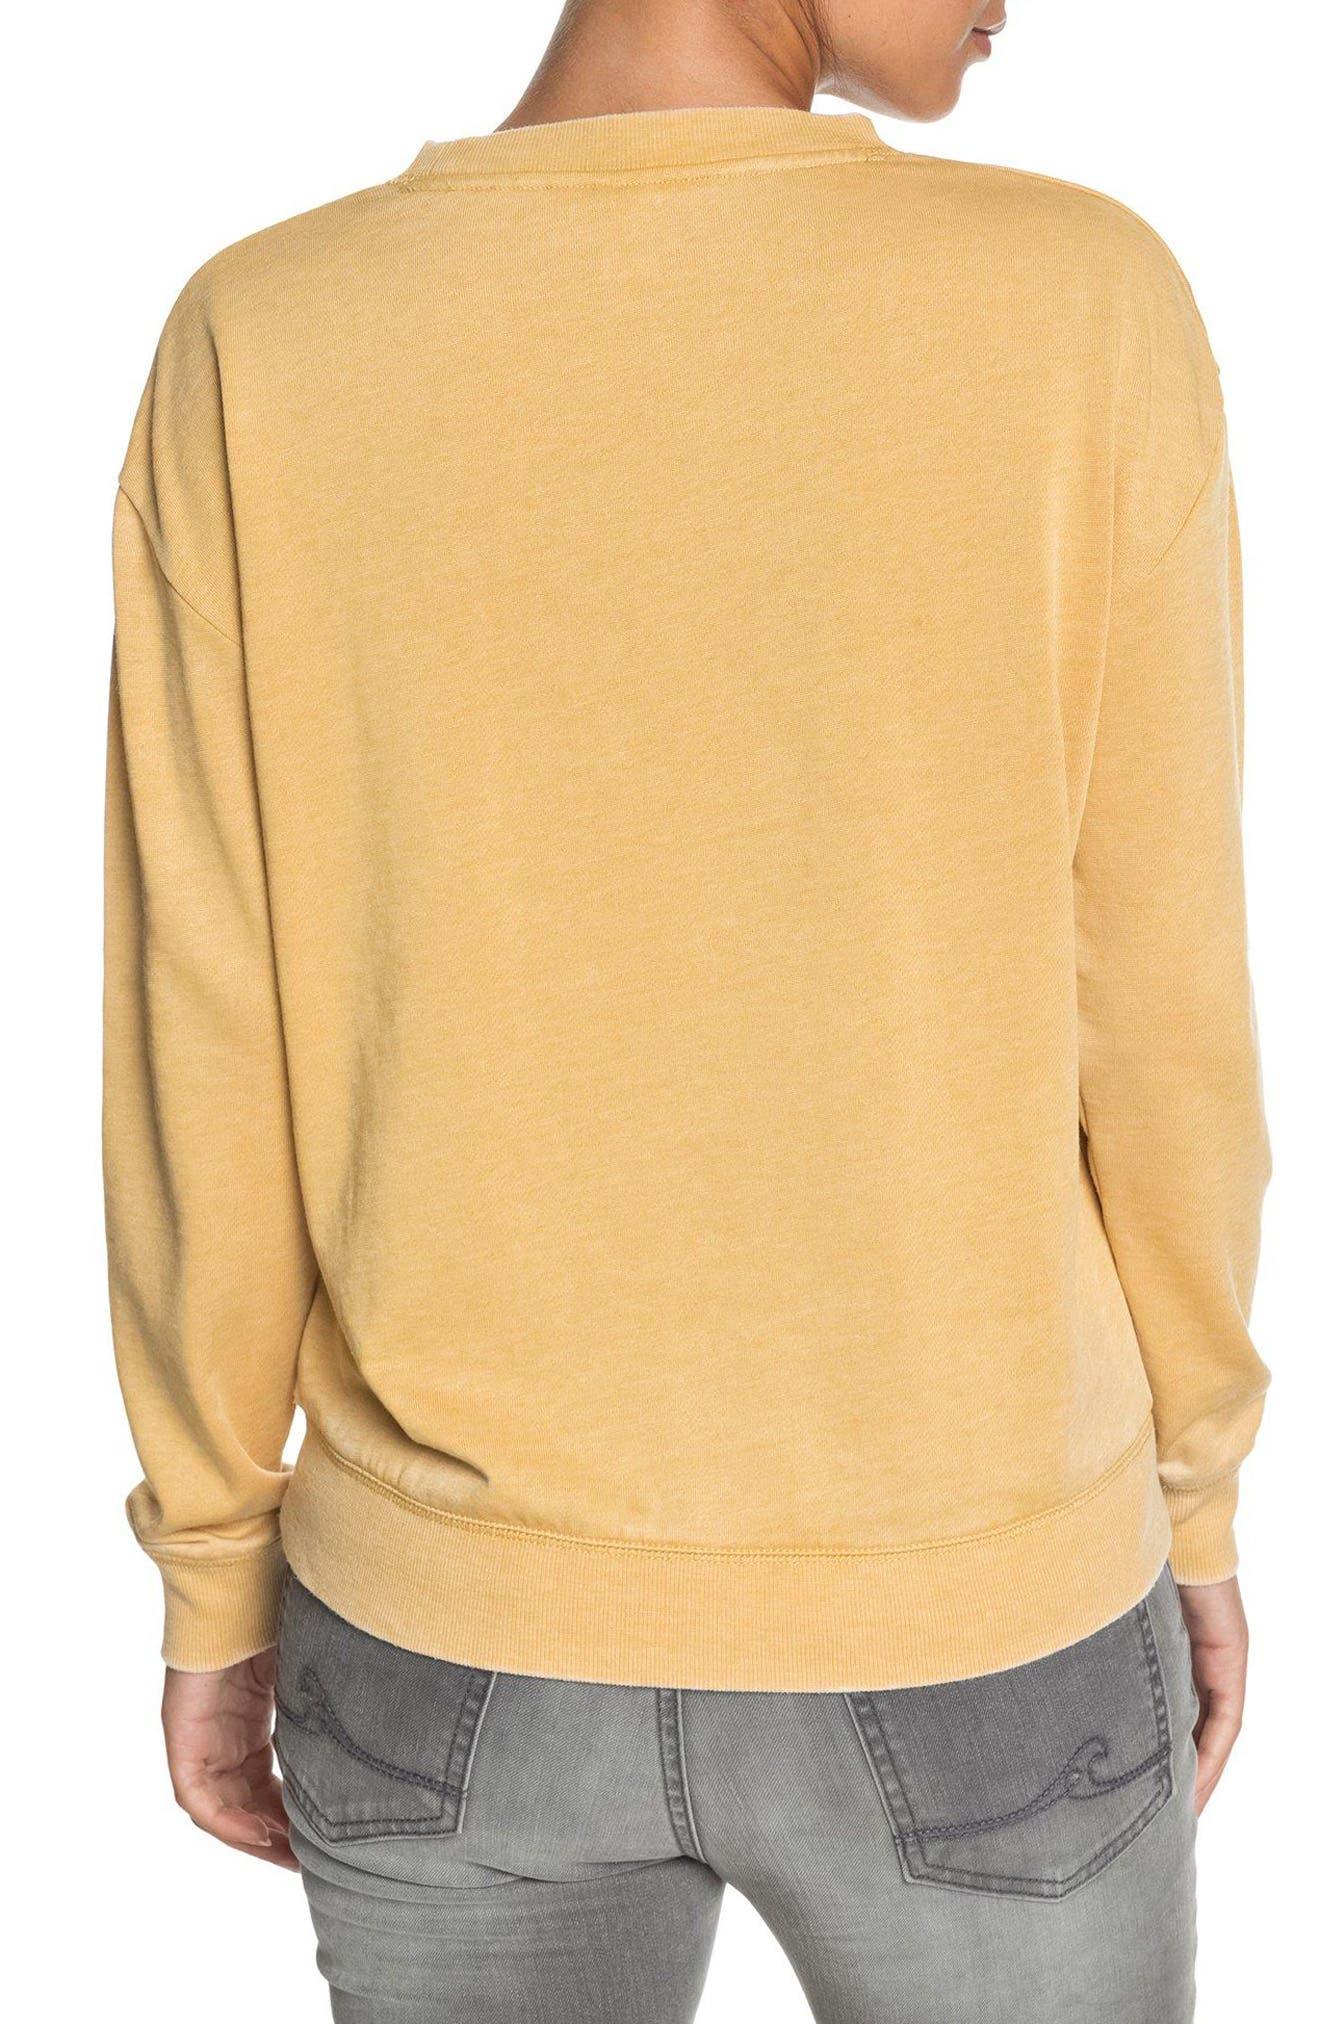 All At Sea Sweatshirt,                             Alternate thumbnail 3, color,                             700